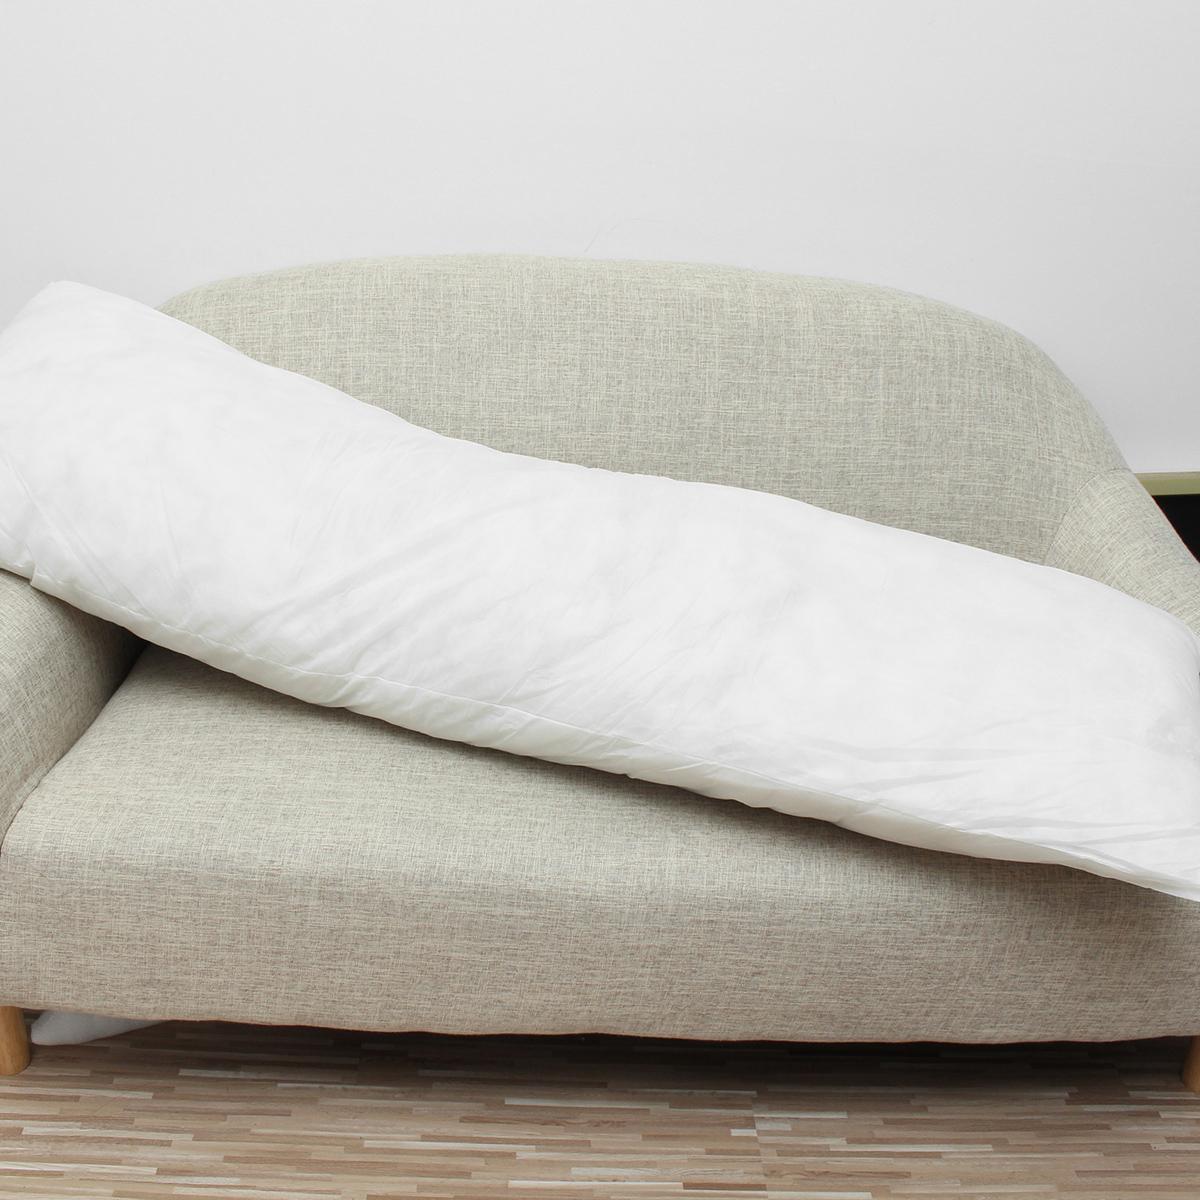 DIY Pillows 150cm 50cm New Anime